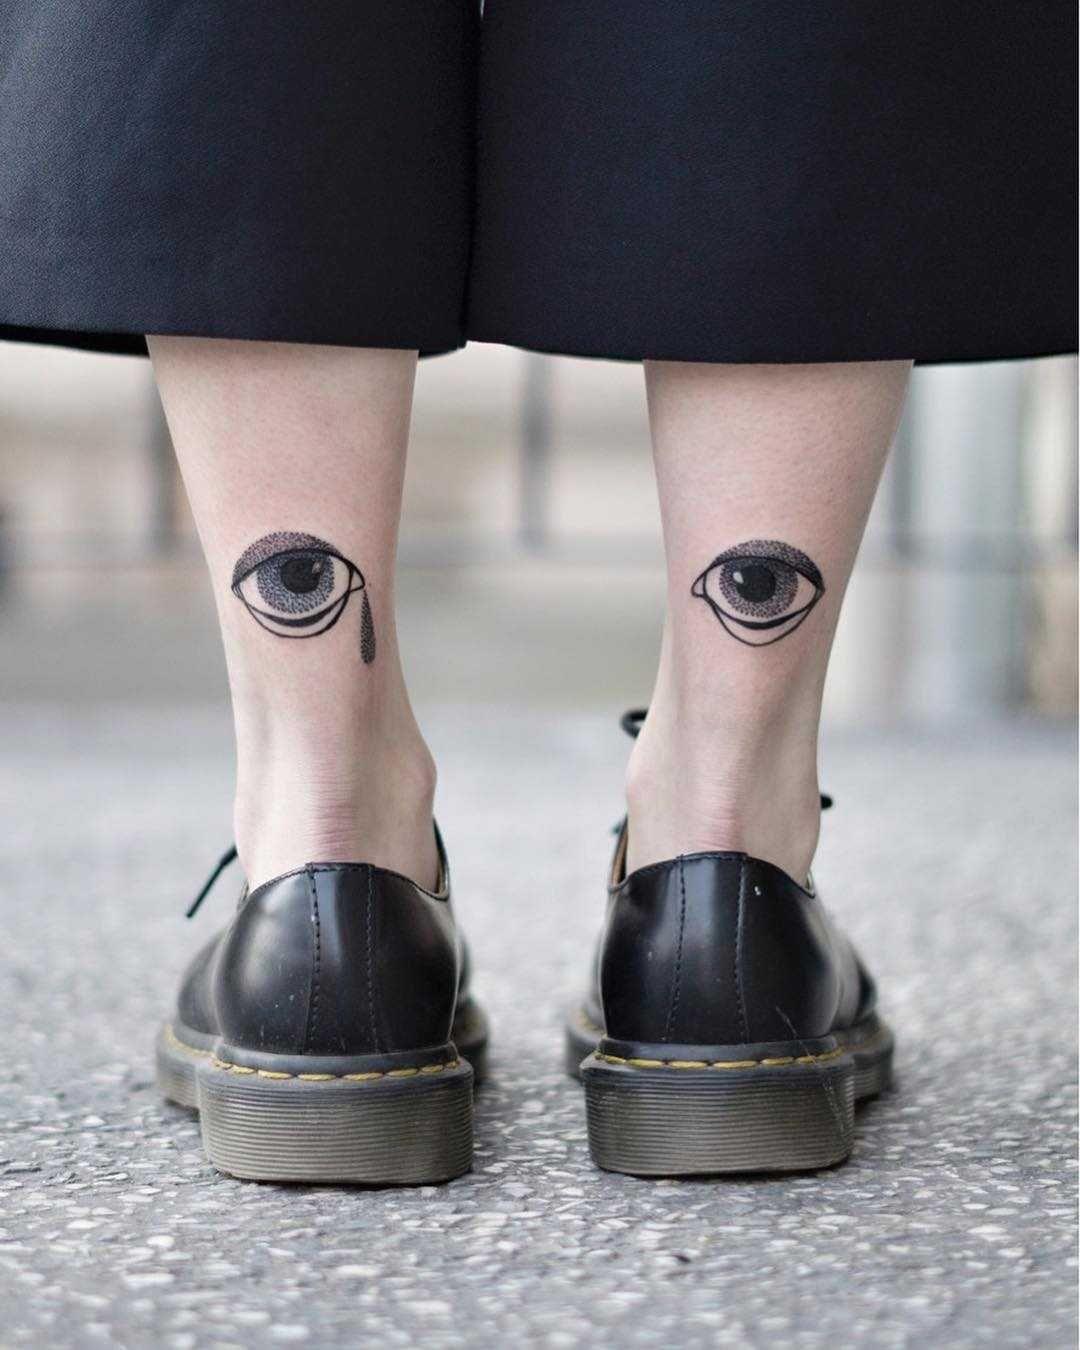 Blackwork eye tattoos by Dżudi Bazgrole (With images